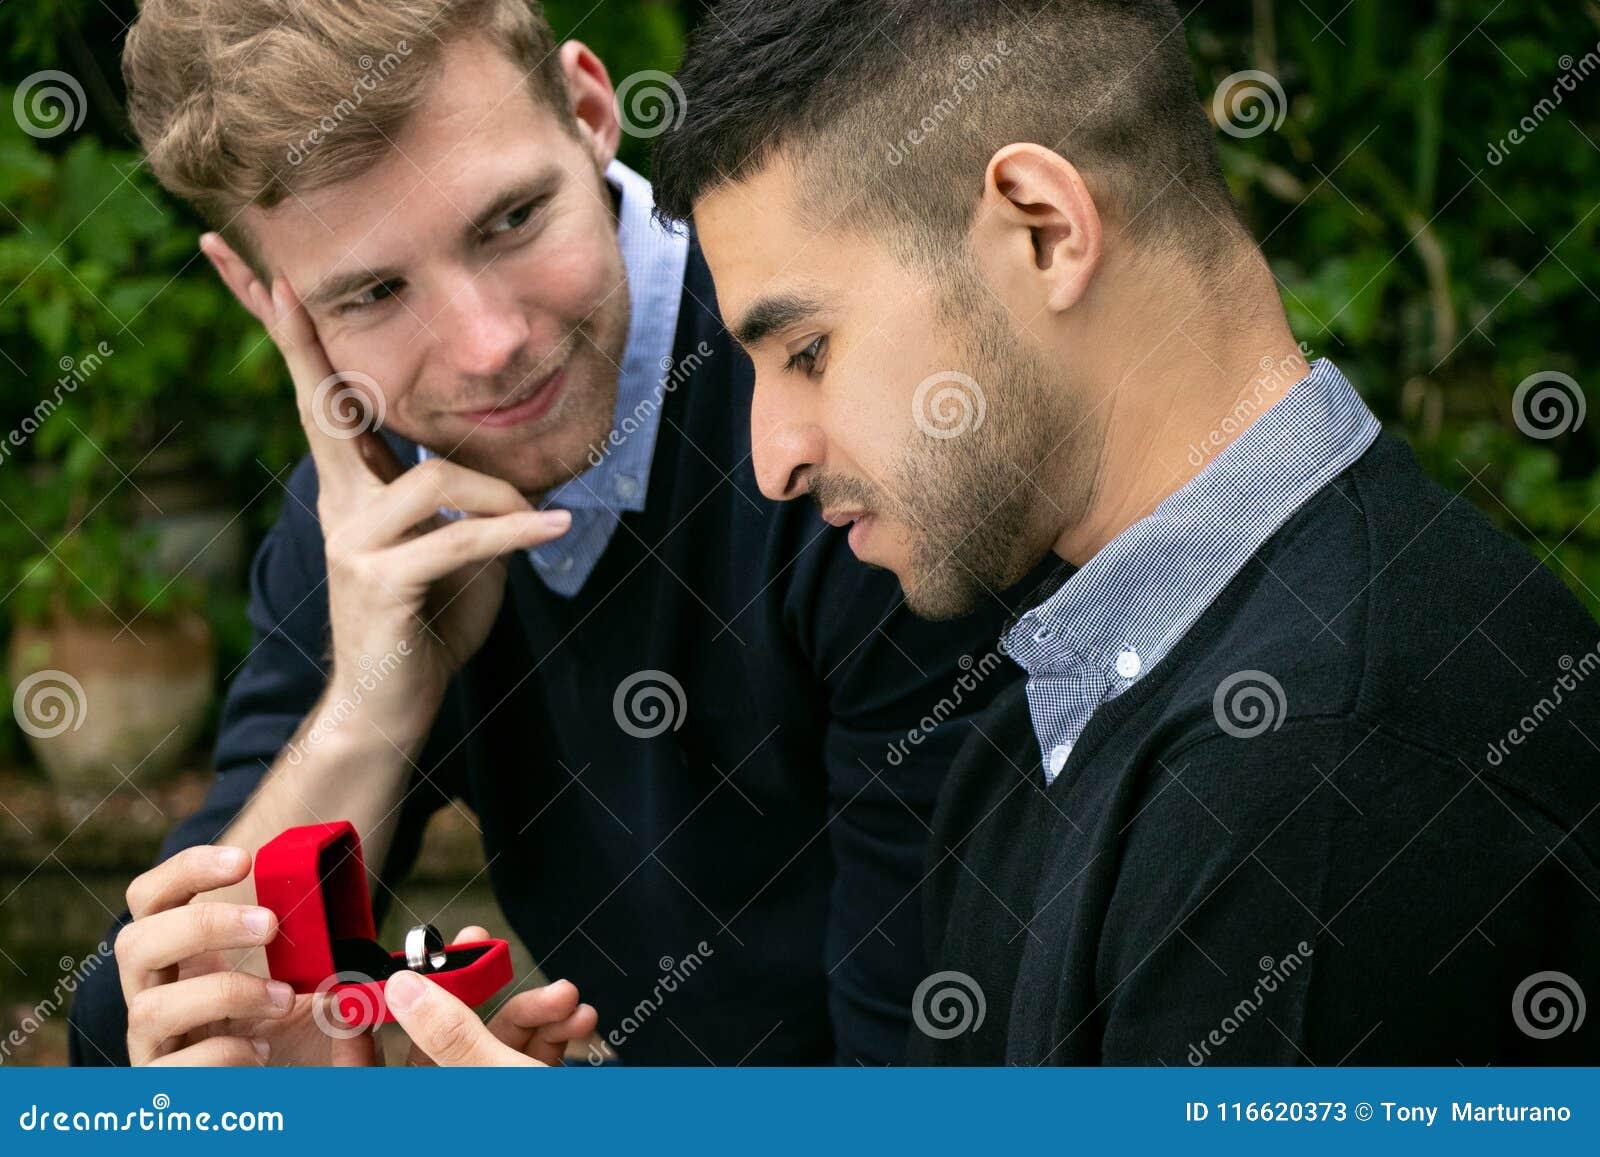 Men Mobile Gay